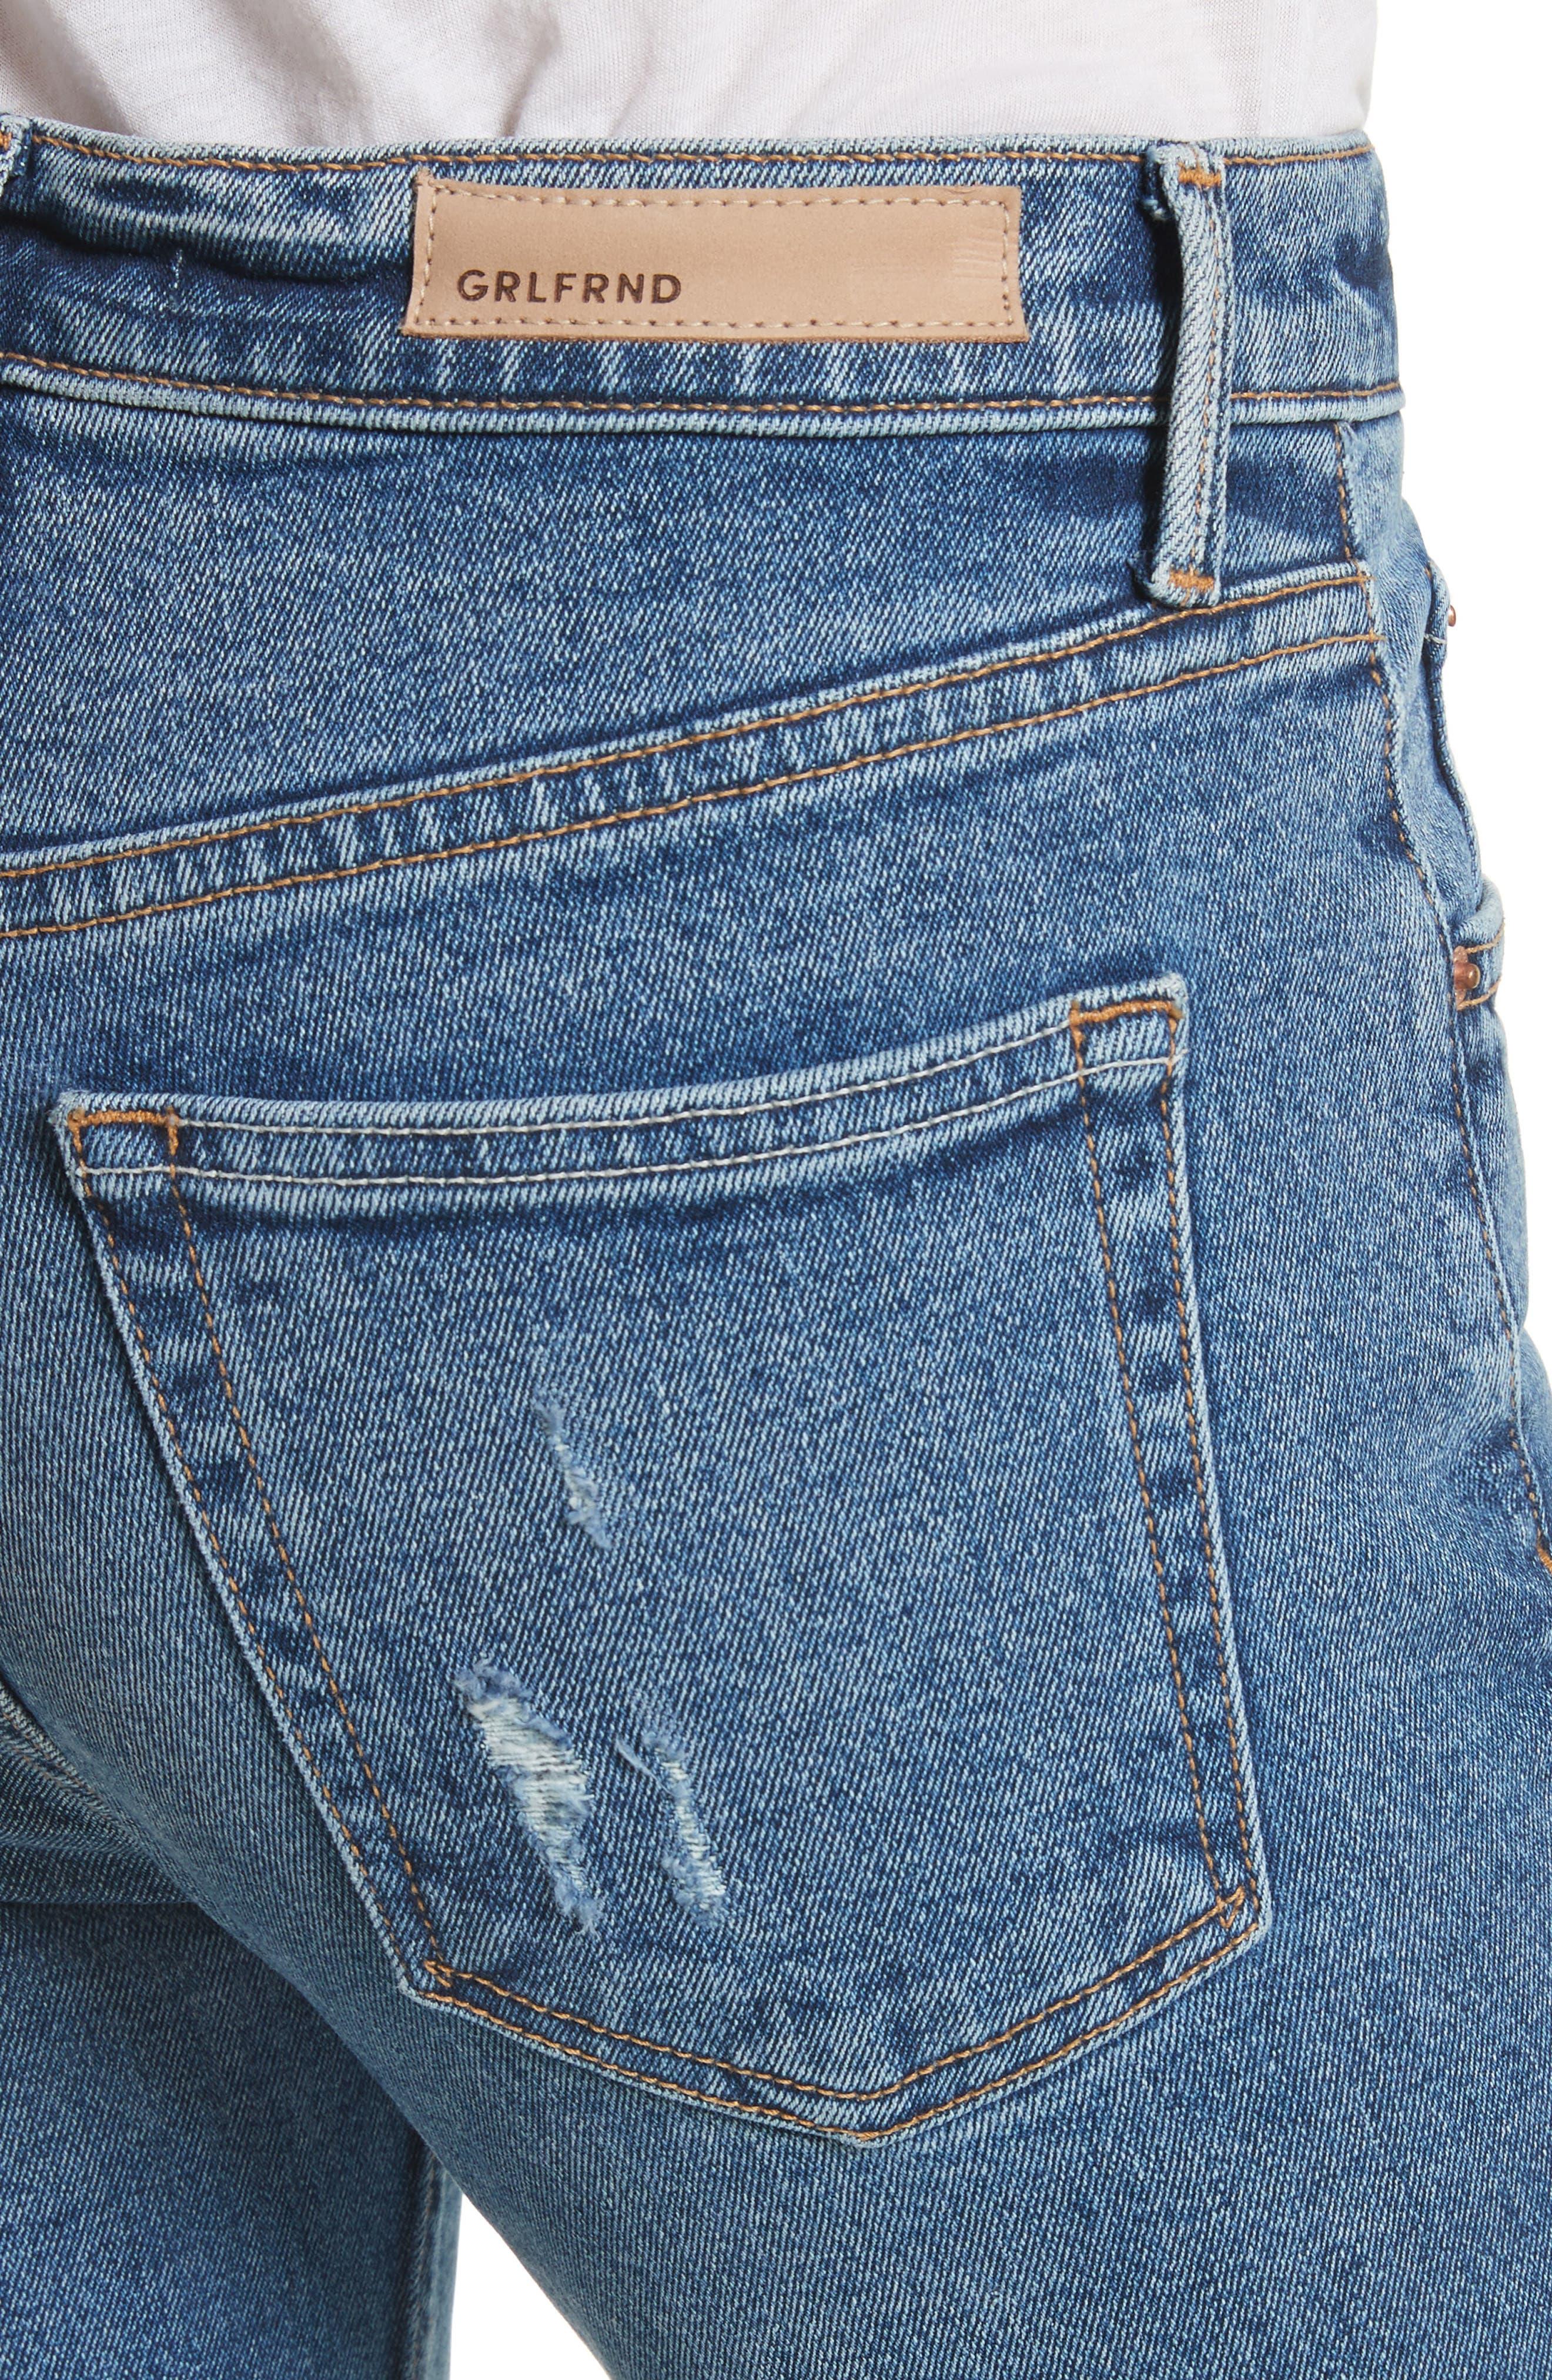 Karolina High Waist Skinny Jeans,                             Alternate thumbnail 4, color,                             Sixpence